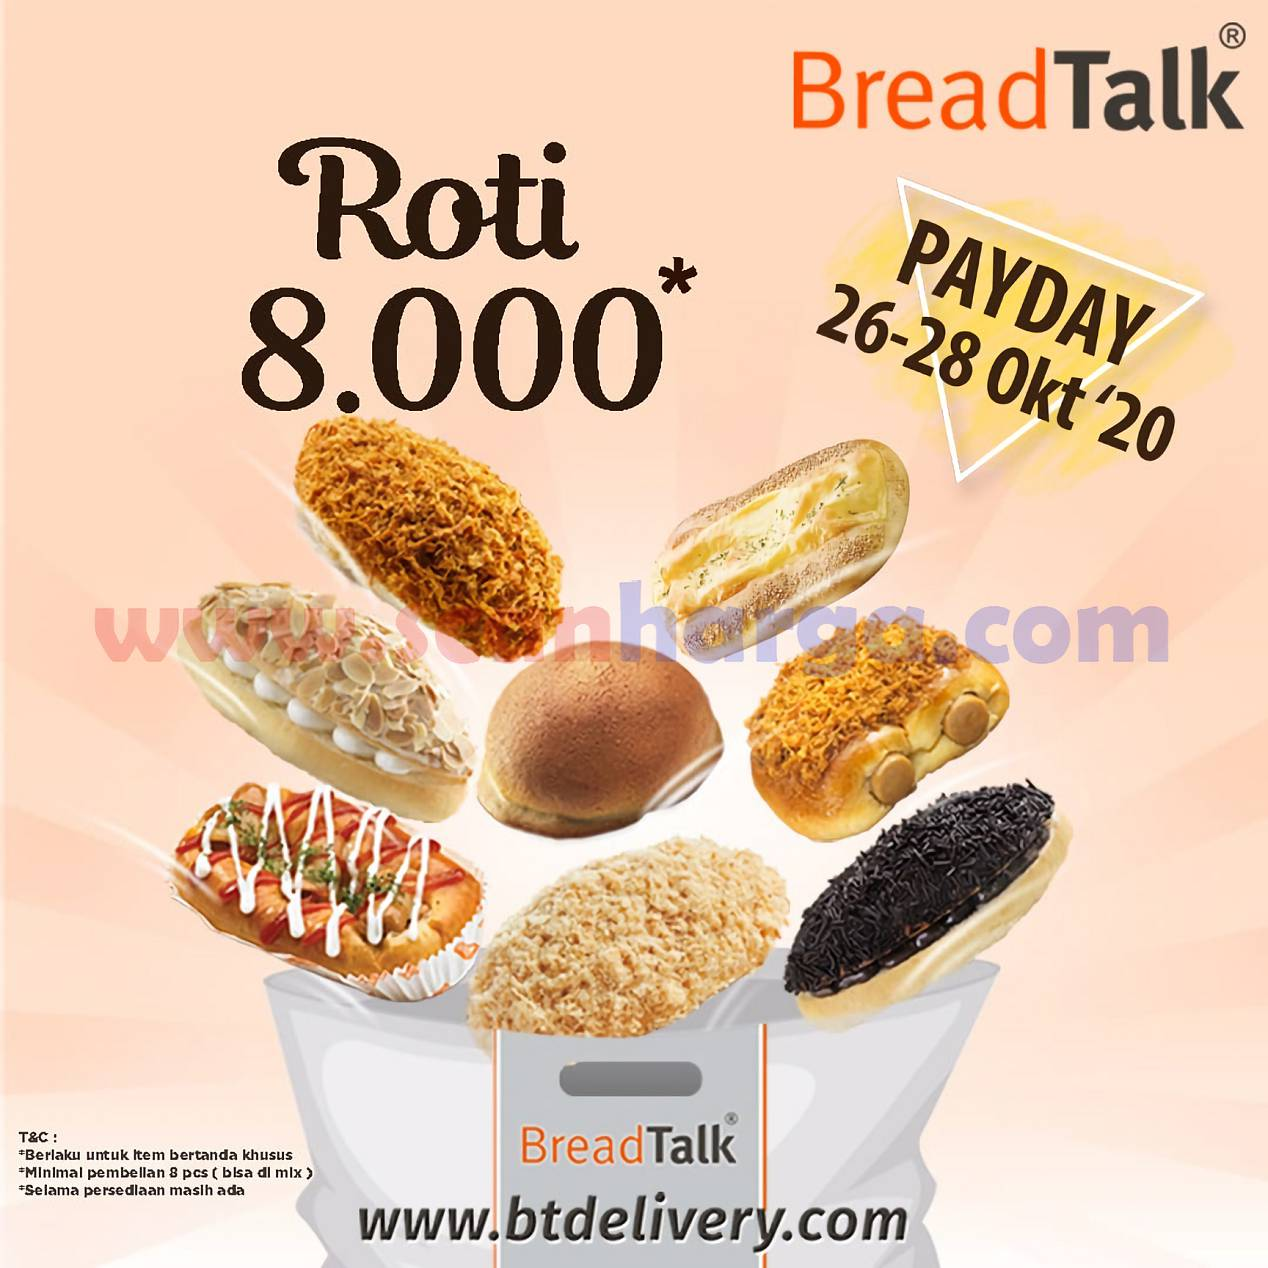 Promo BREADTALK PAYDAY harga Roti Cuma Rp 8.000*